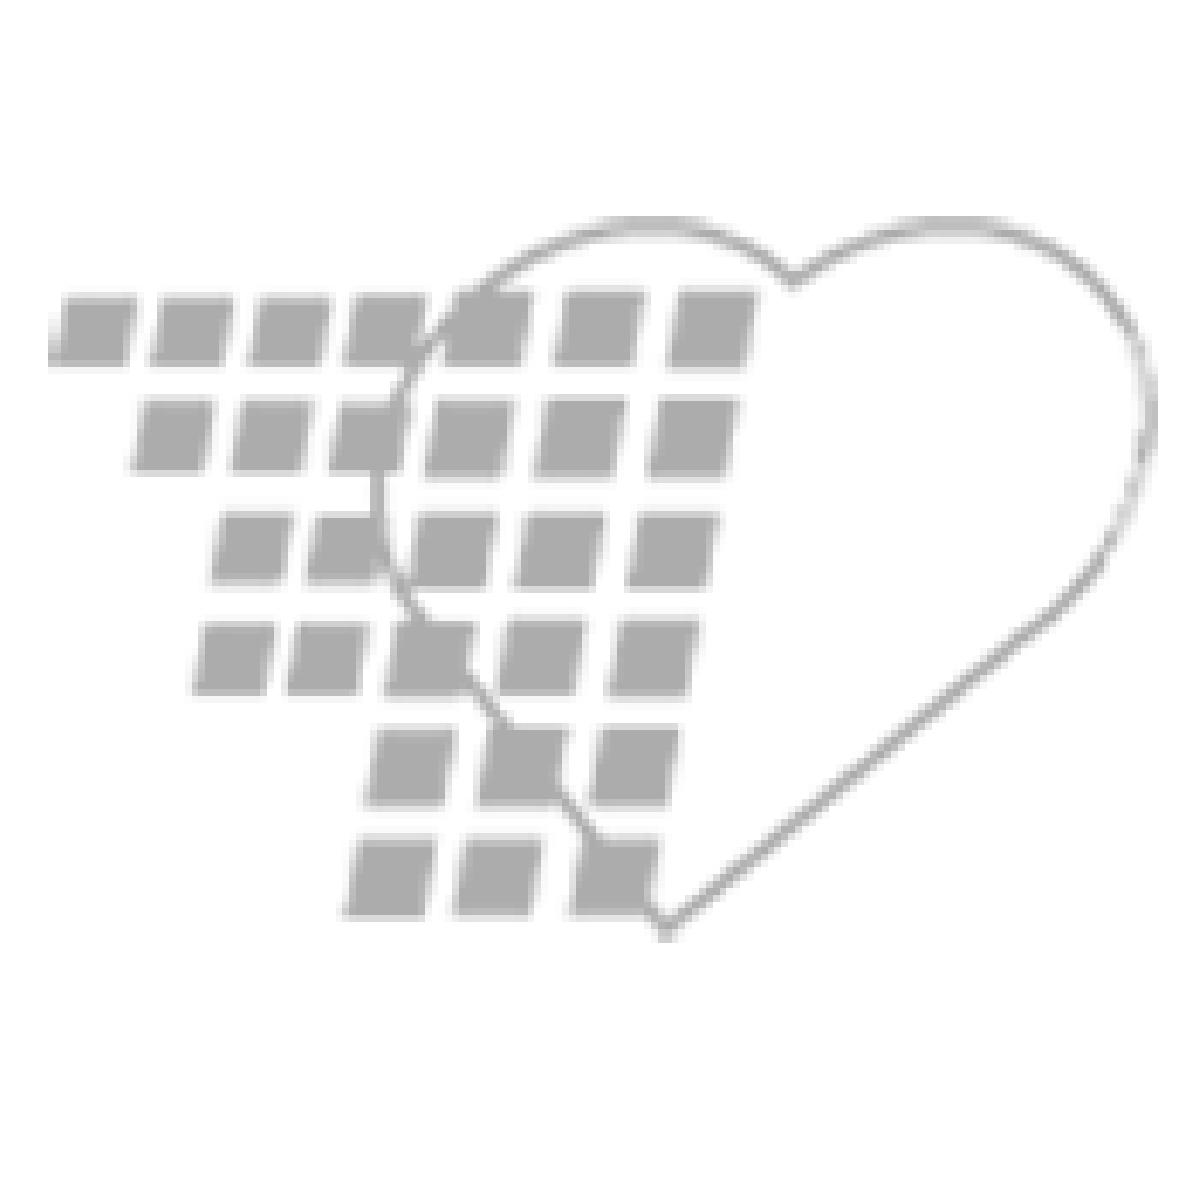 06-93-1130 Demo Dose® Epinephrn 10mL